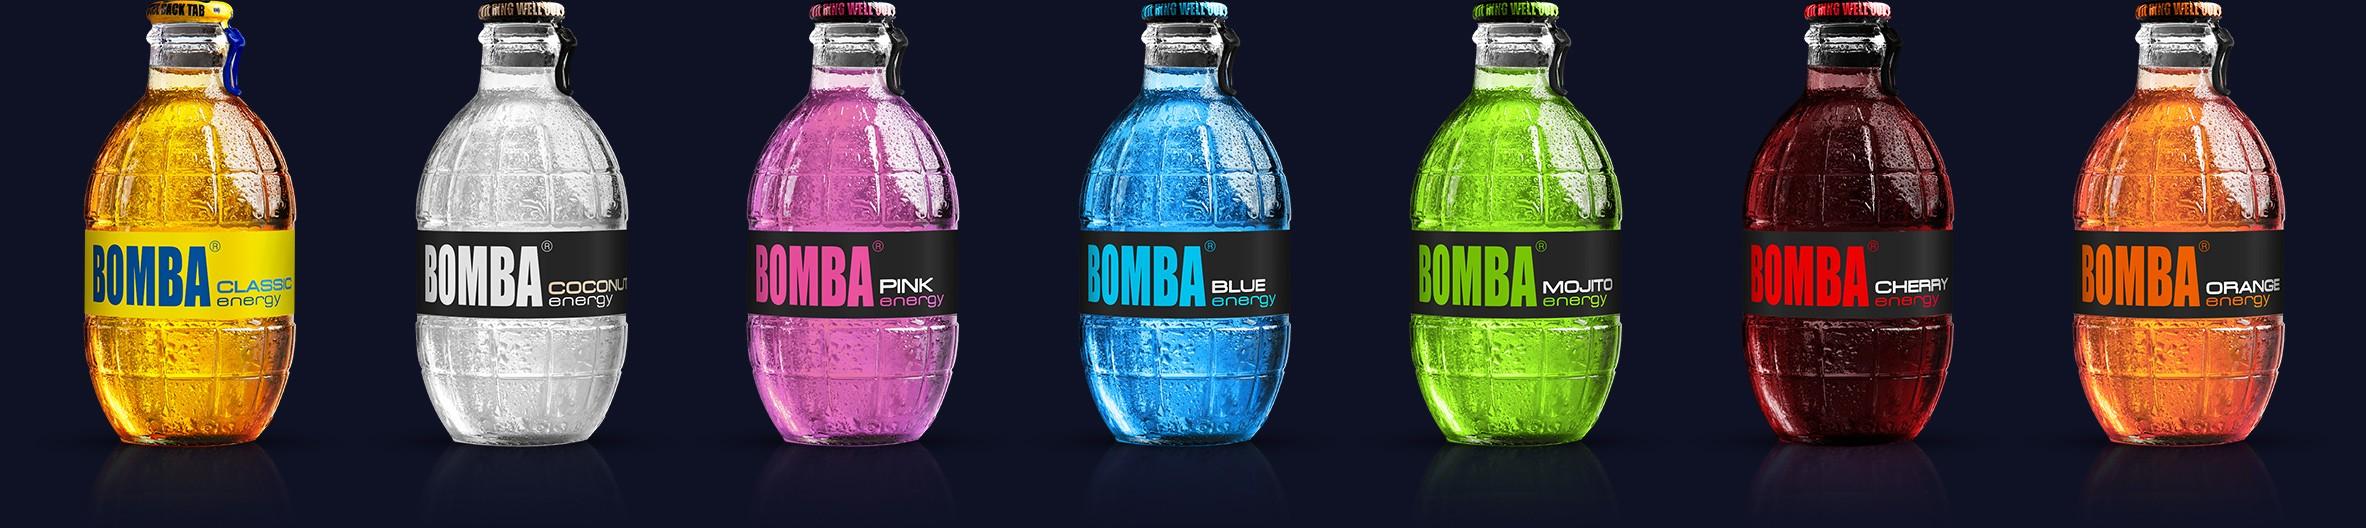 alle-bomba-energy-drink-sorten-an-lager-schweiz-switzerland-bestellen